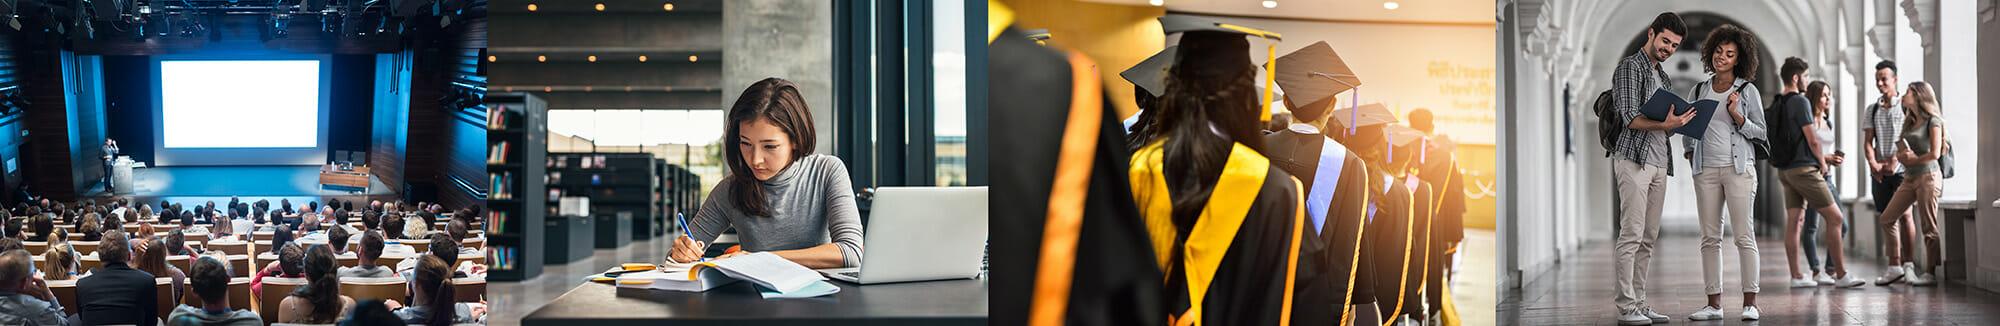 college degree graduation studying university